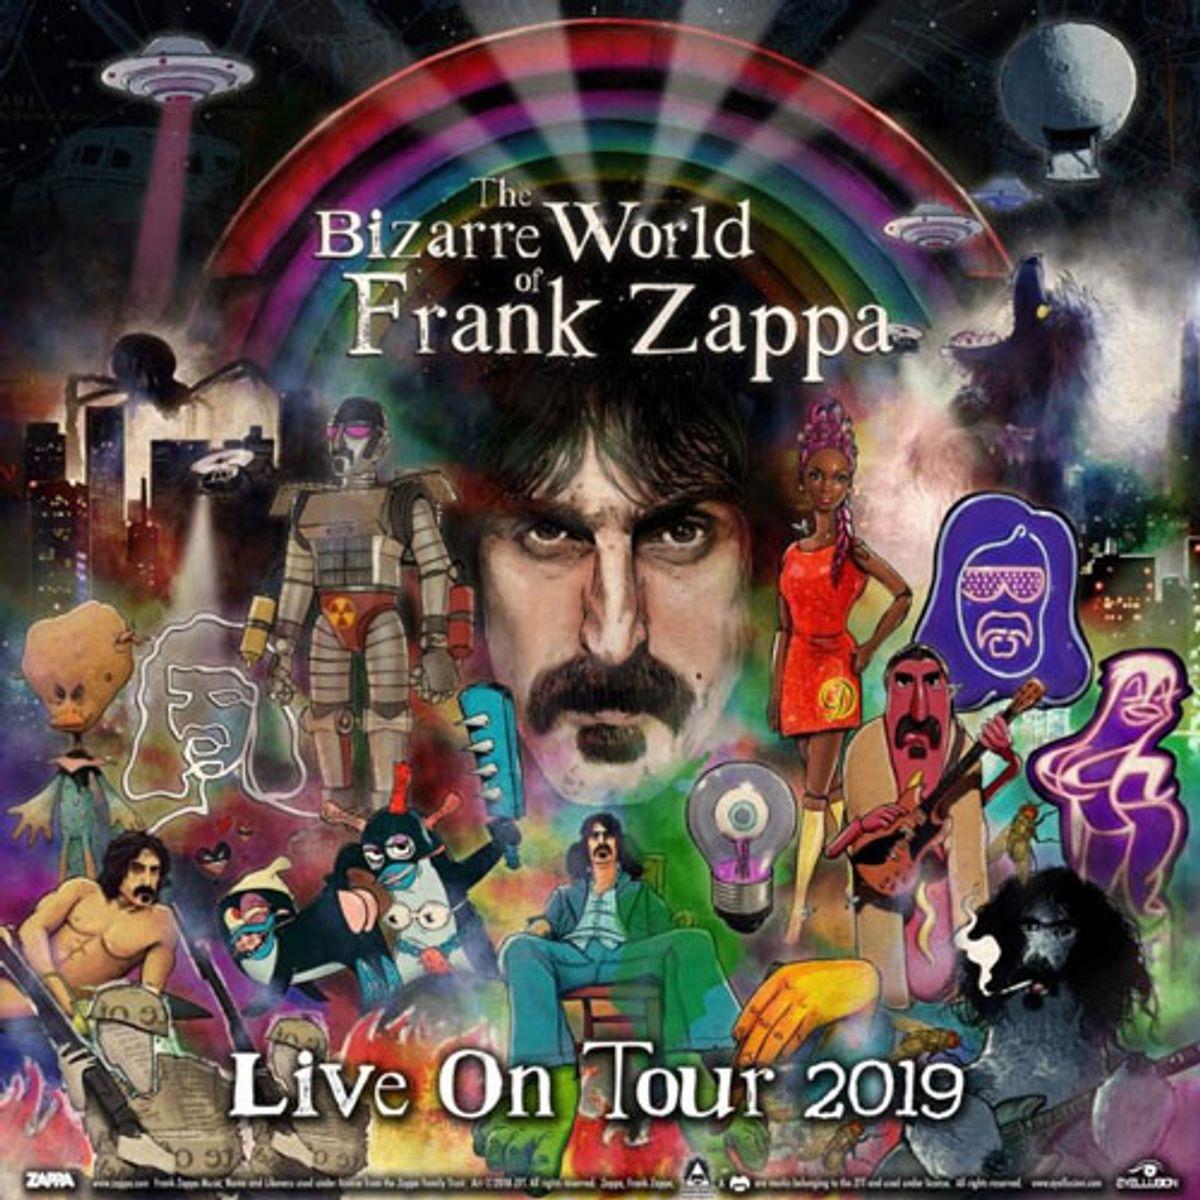 Zappa Family Trust Announces Frank Zappa Hologram Tour